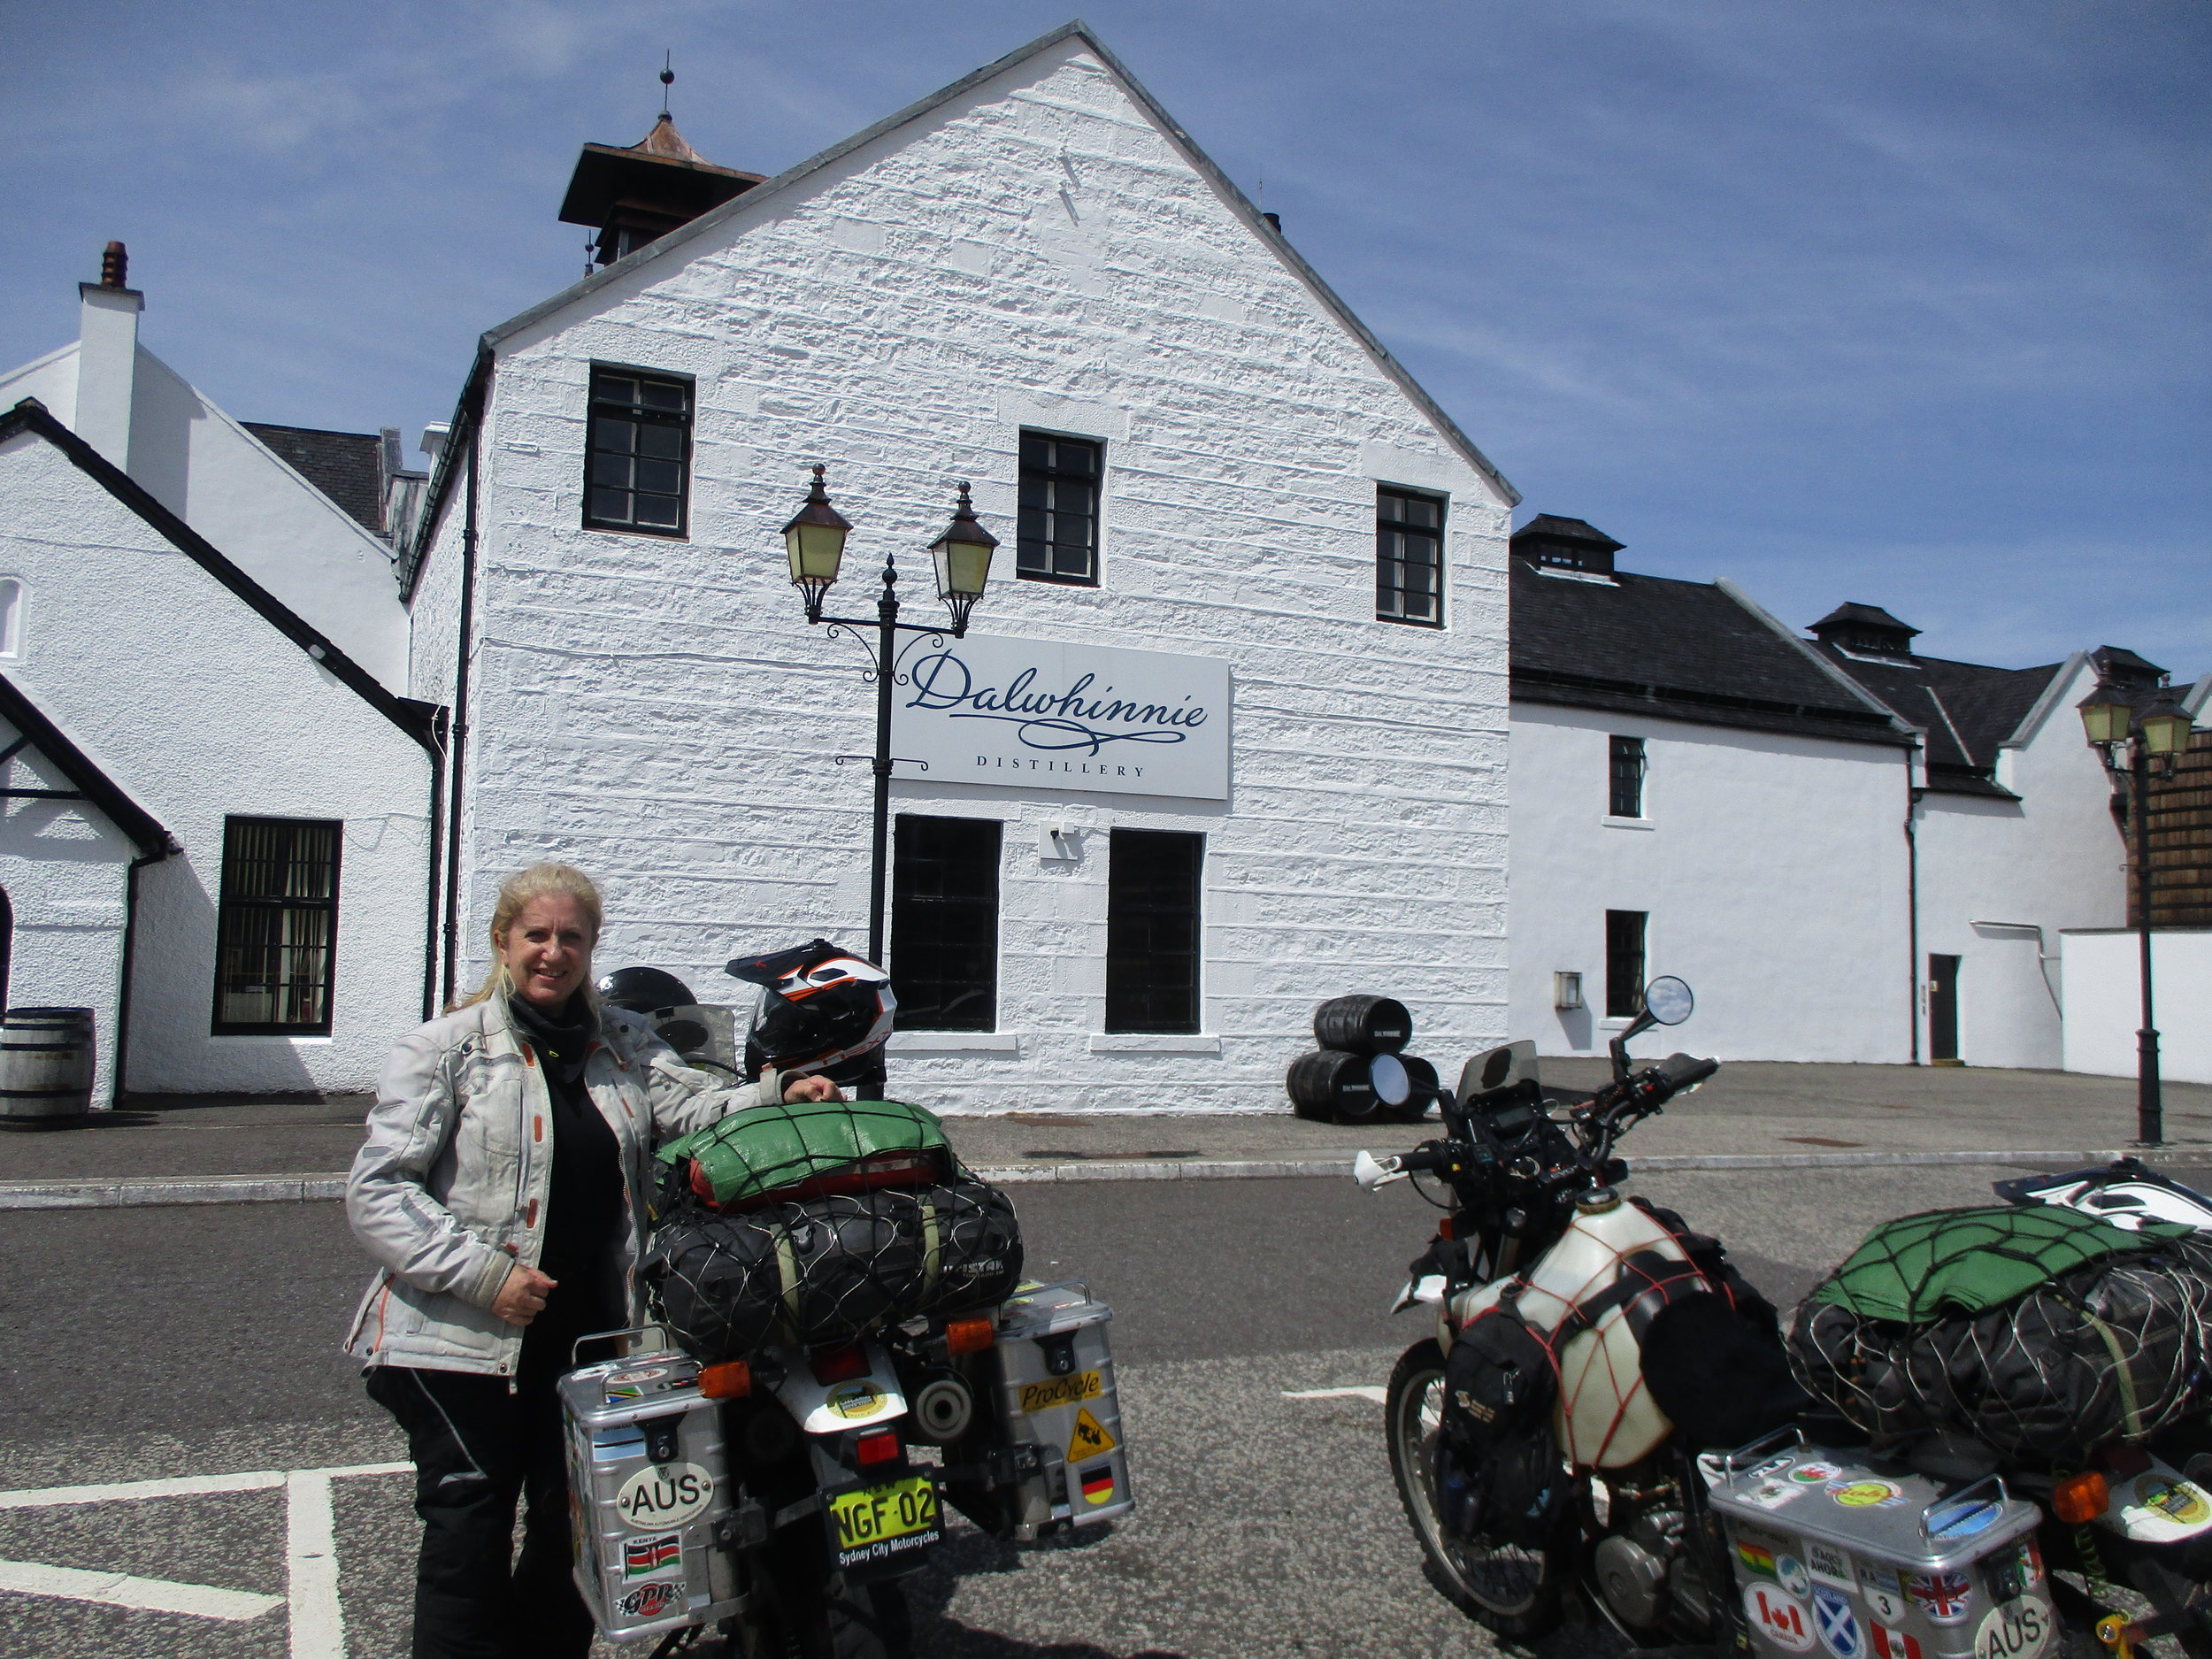 Ah, Dalwinne Whiskey distillery. We didn't do a tour - just window shopping :)